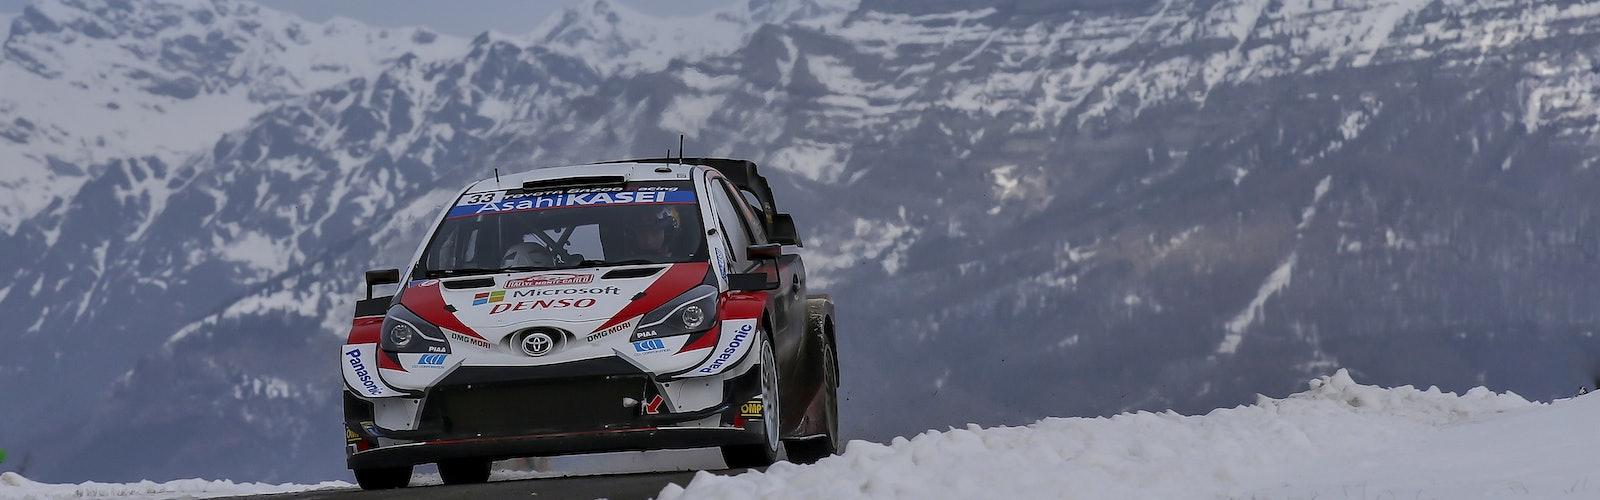 WRC_2020_Rd.1_421